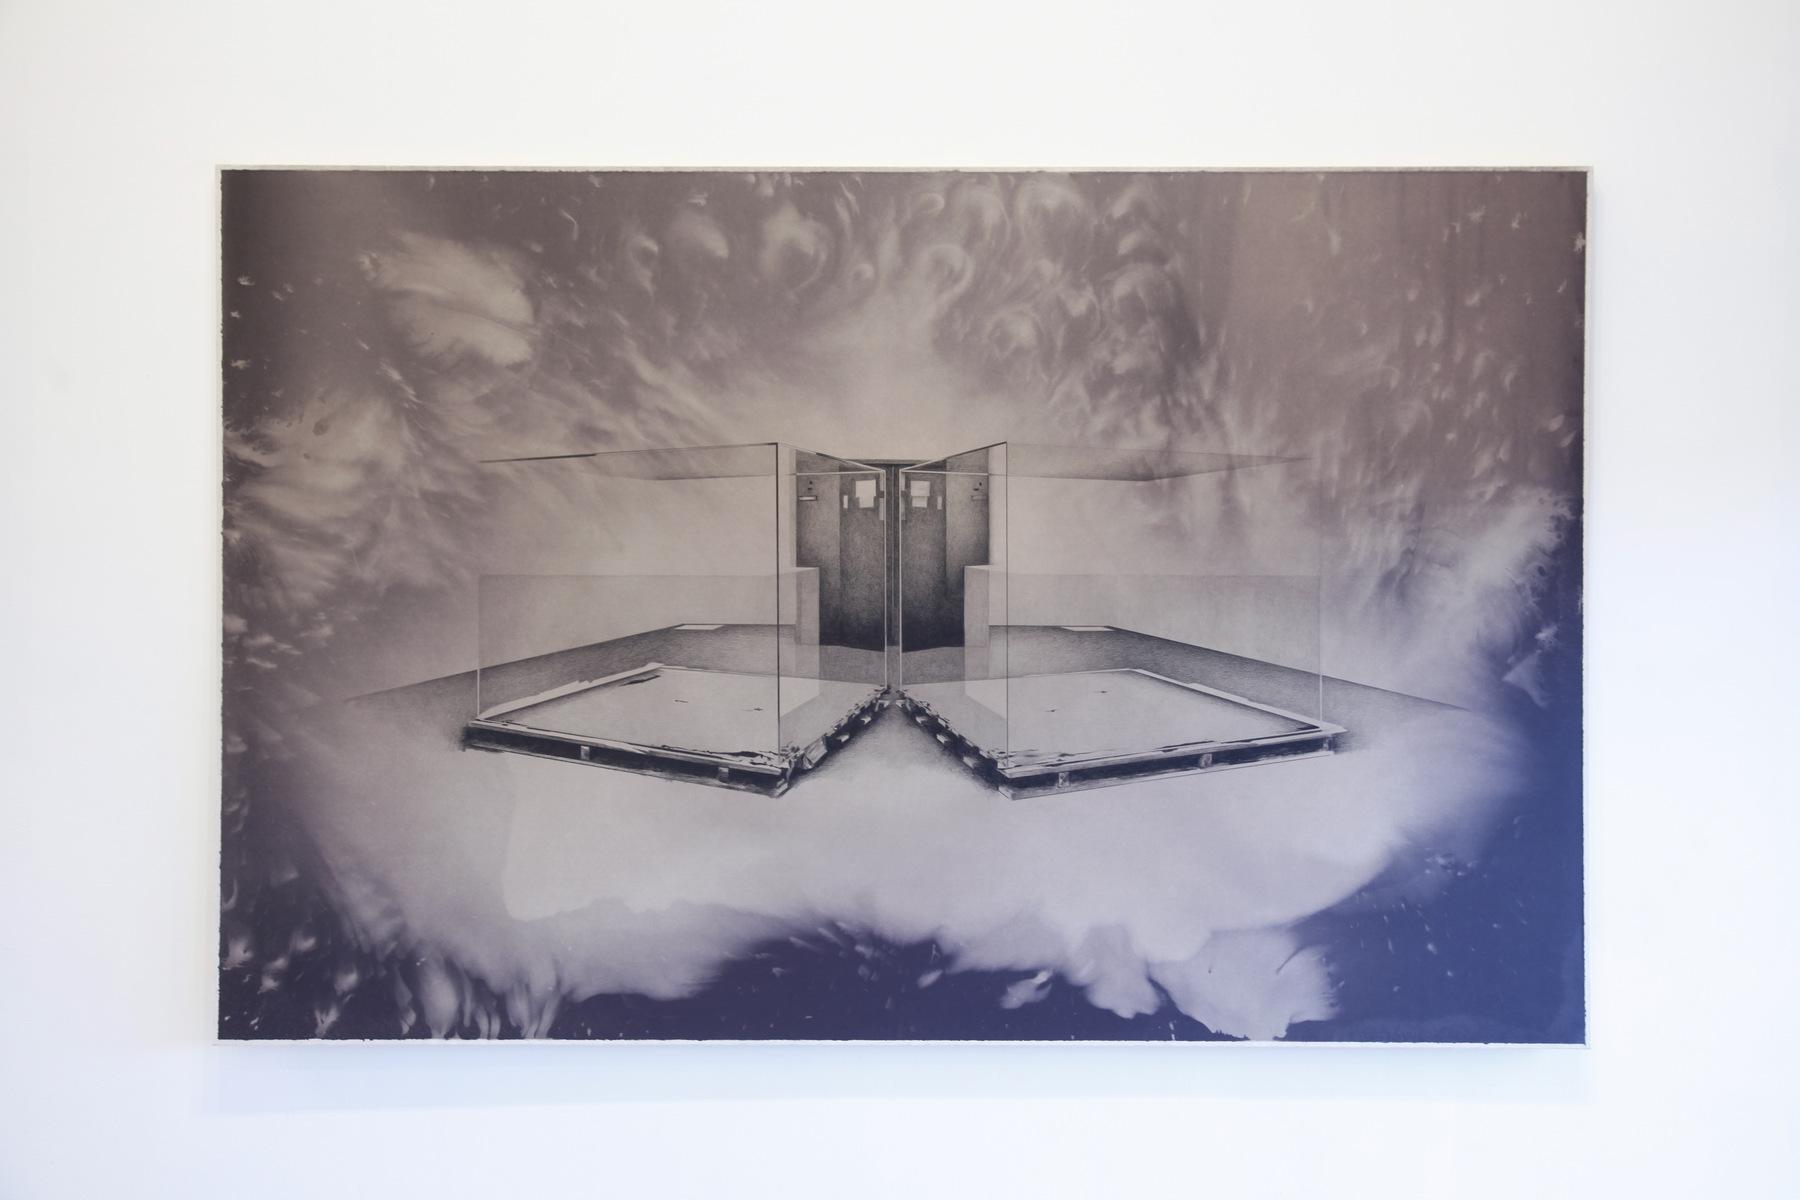 Tatiana Trouve at Galerie Perrotin 02